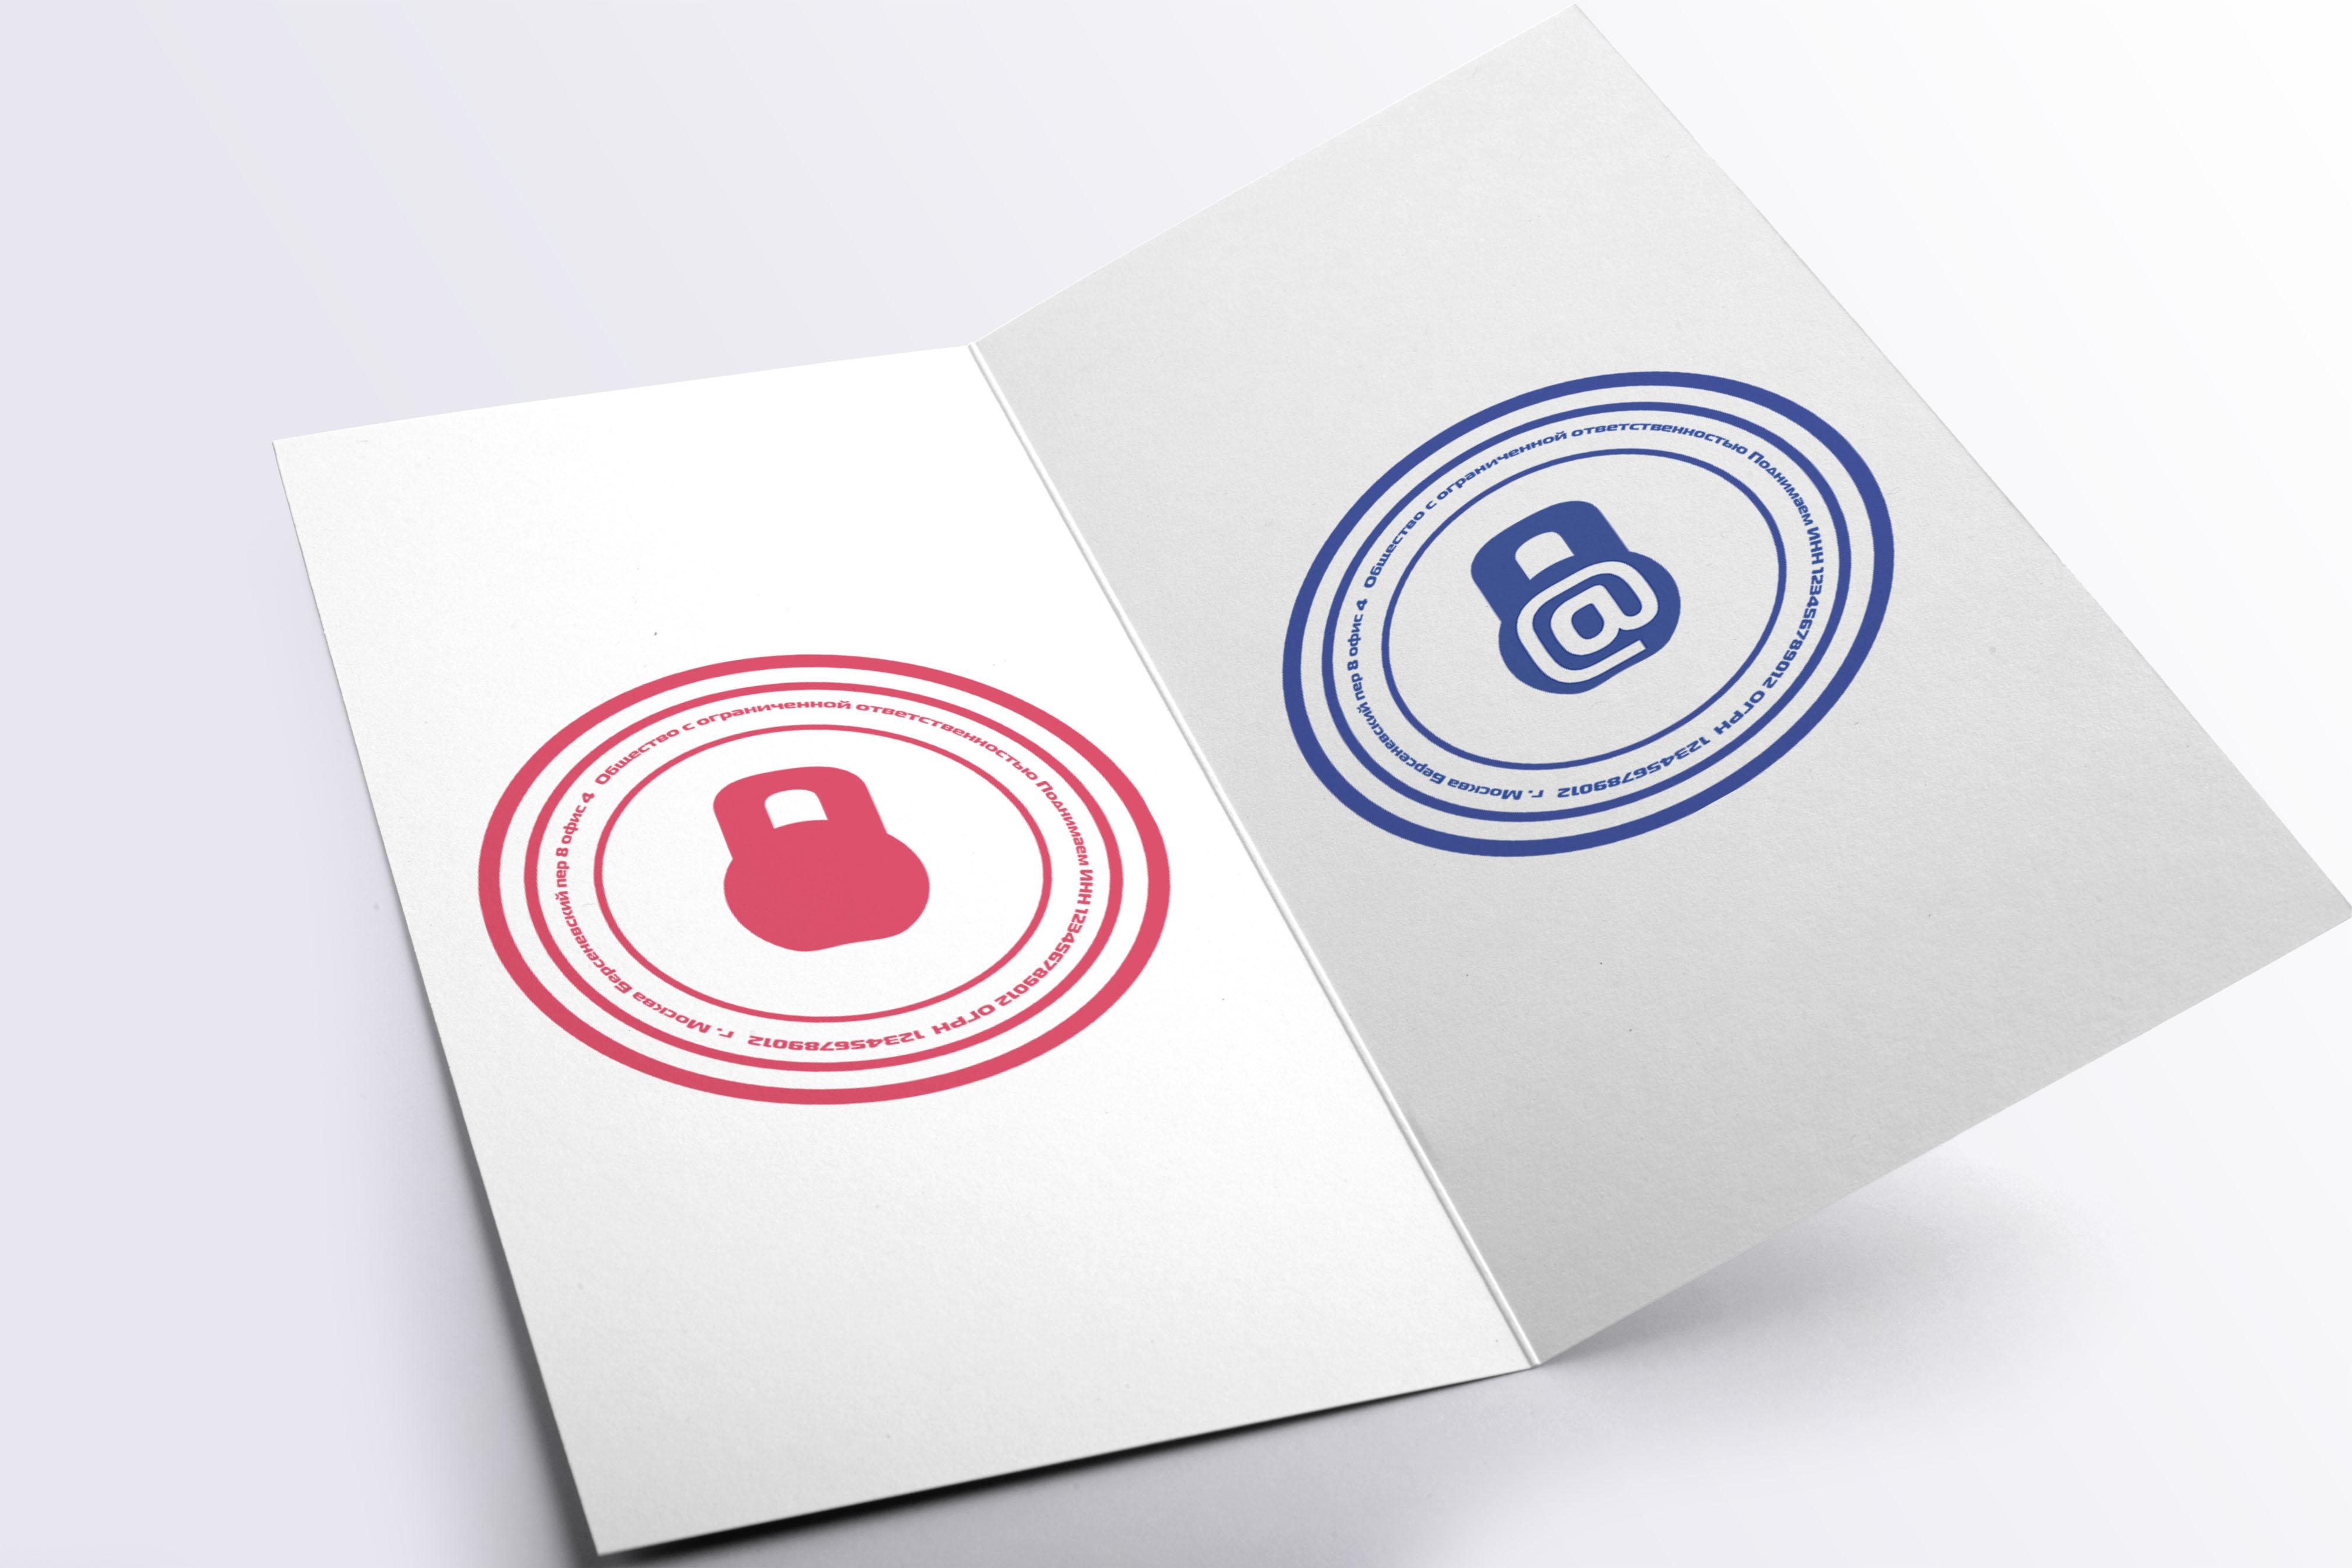 Разработать логотип + визитку + логотип для печати ООО +++ фото f_9475546ca36d7996.jpg